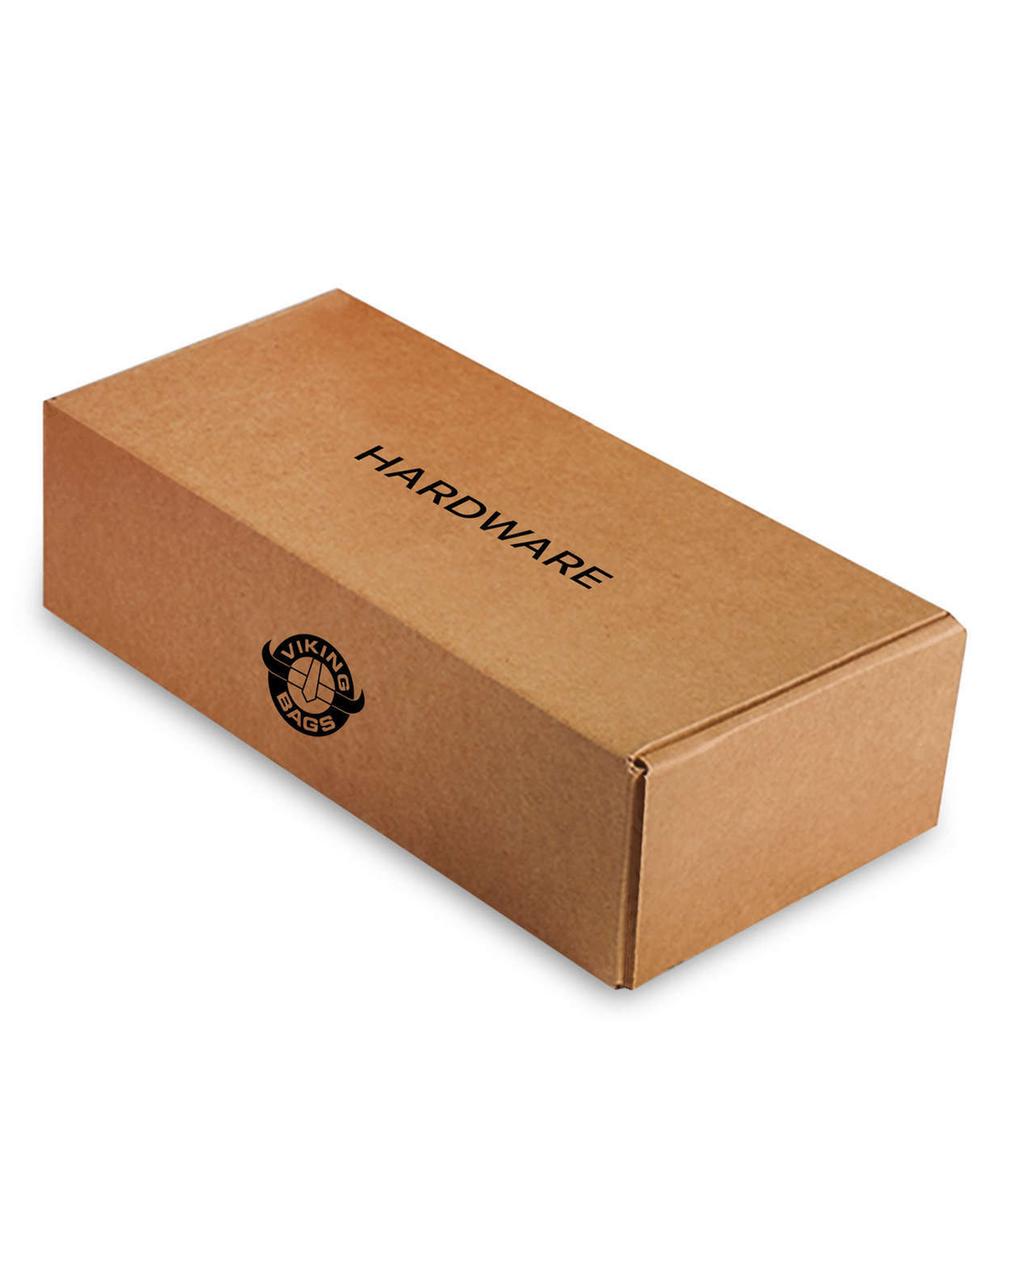 Honda Magna 750 Spear Shock Cutout Motorcycle Saddlebags Hardware box